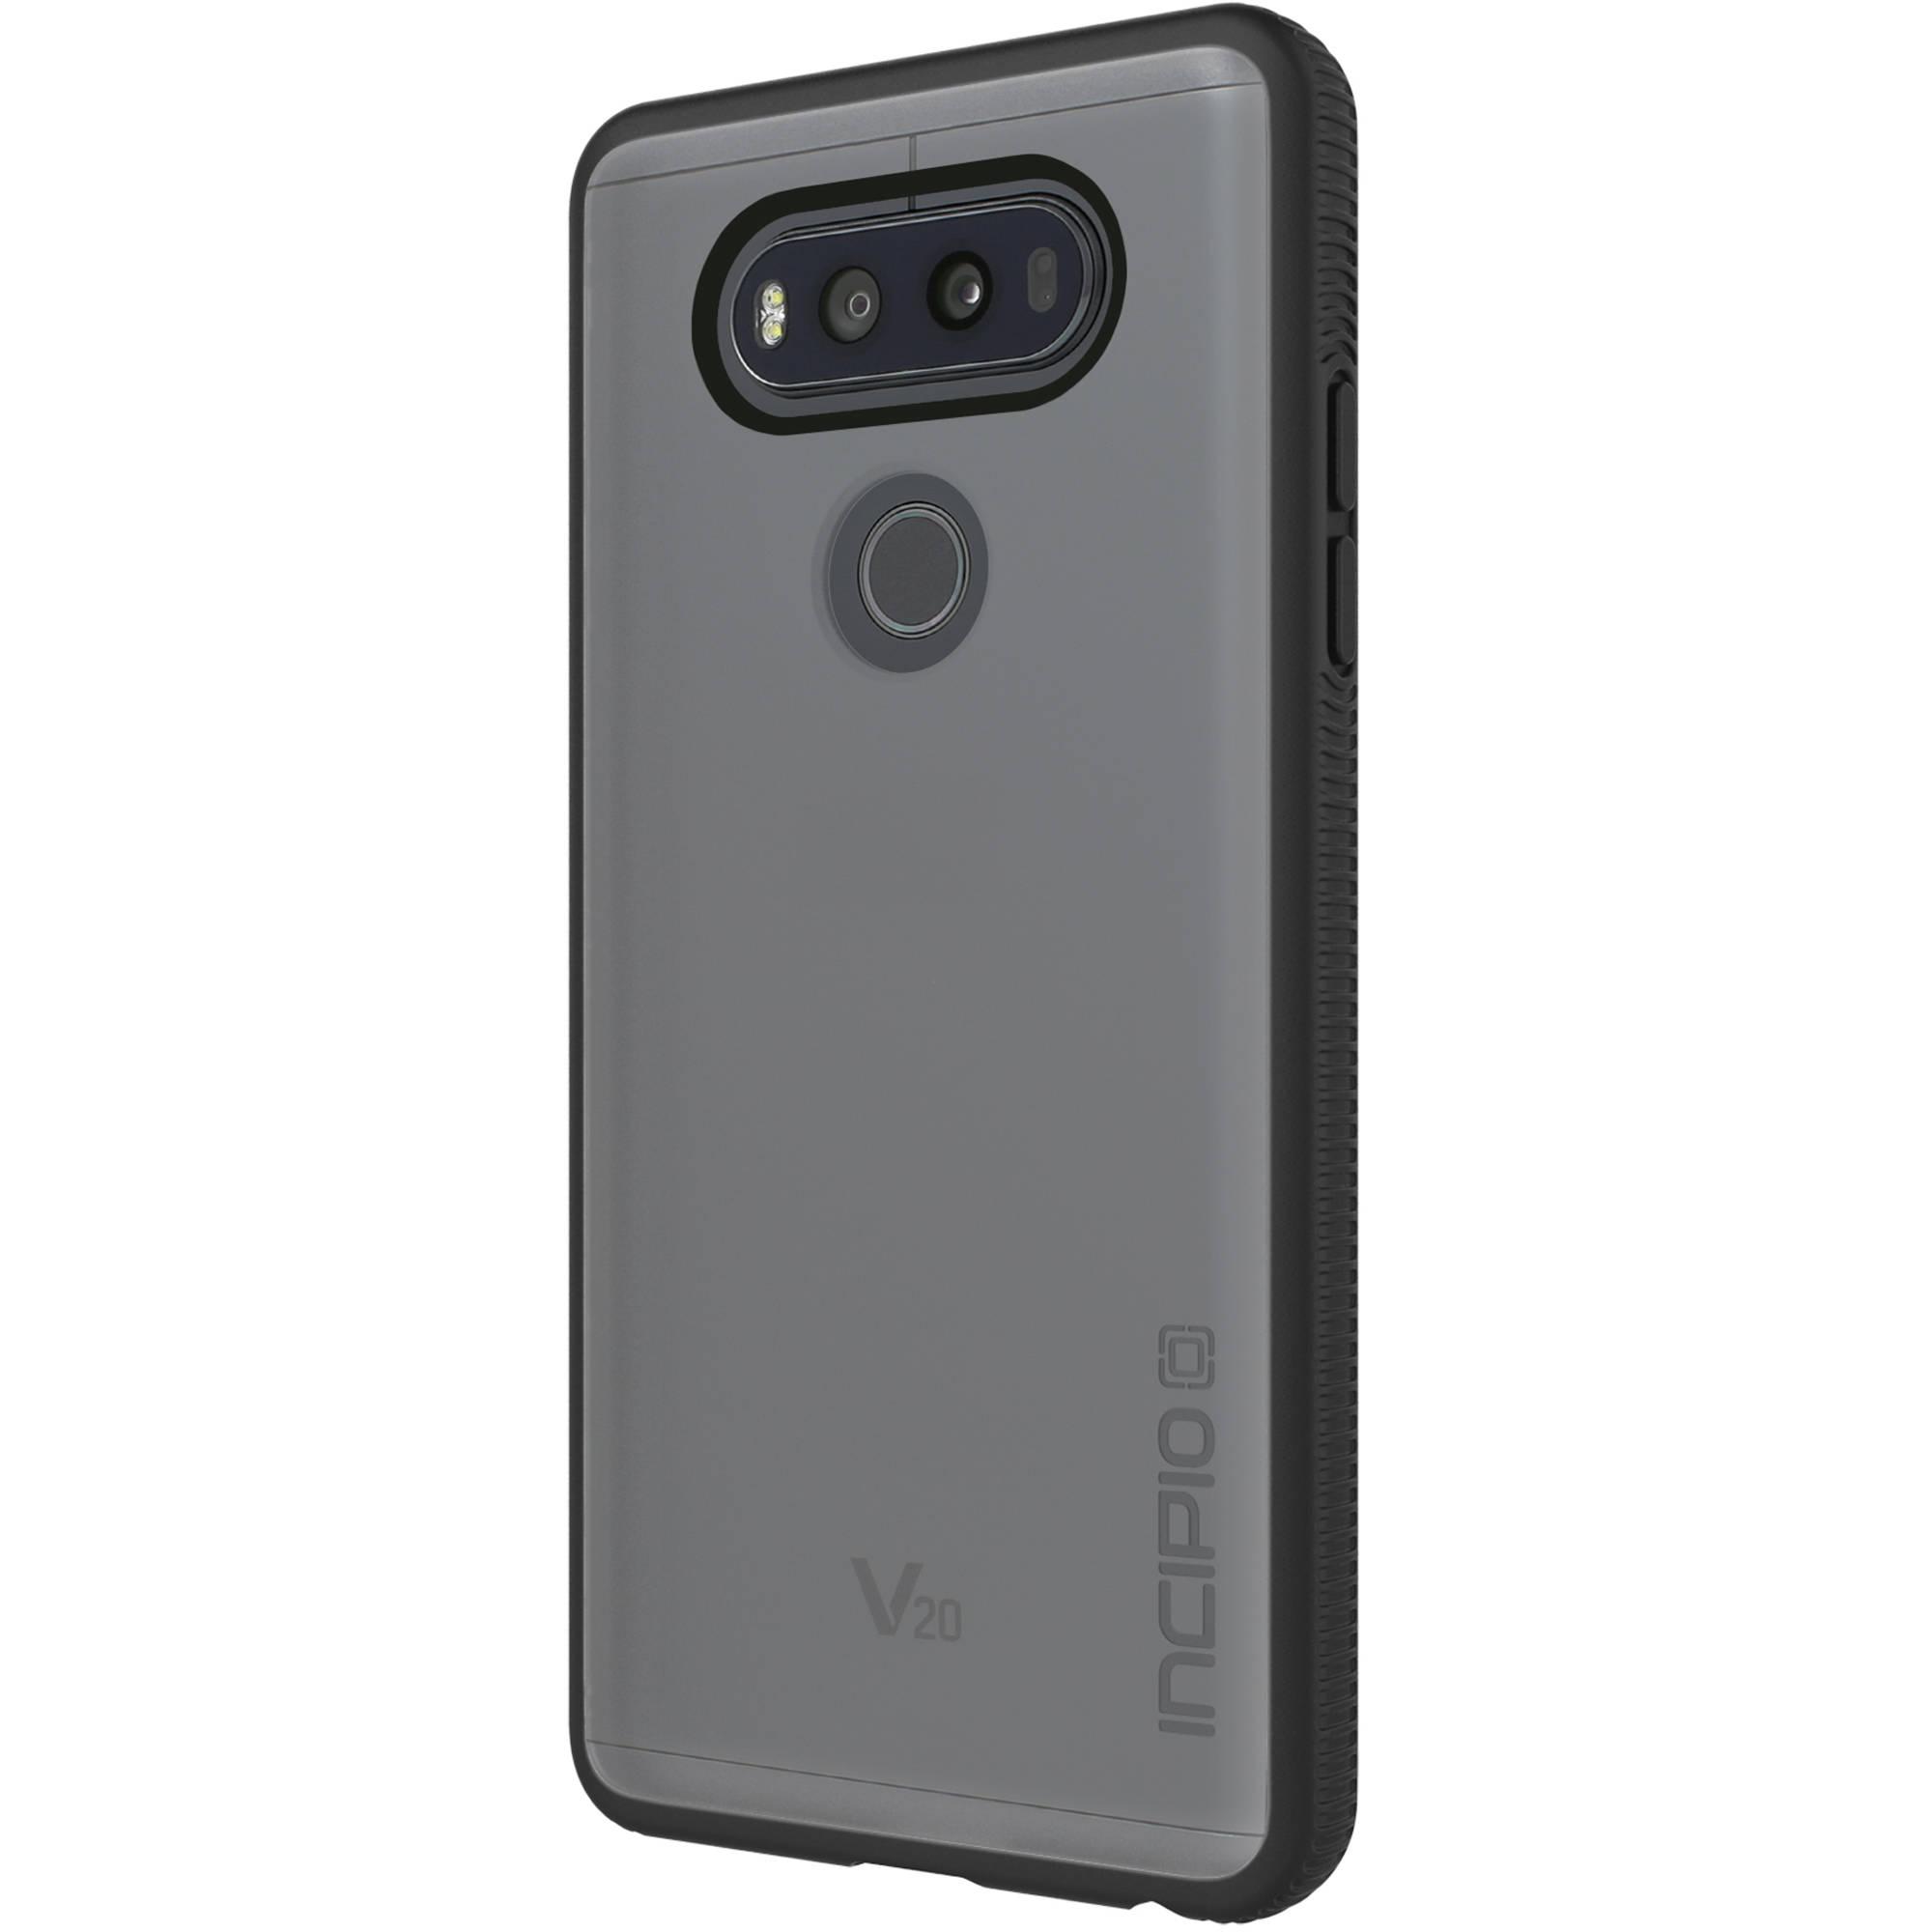 huge discount 618fd e62b8 Incipio Octane Case for LG V20 (Black/Frost)